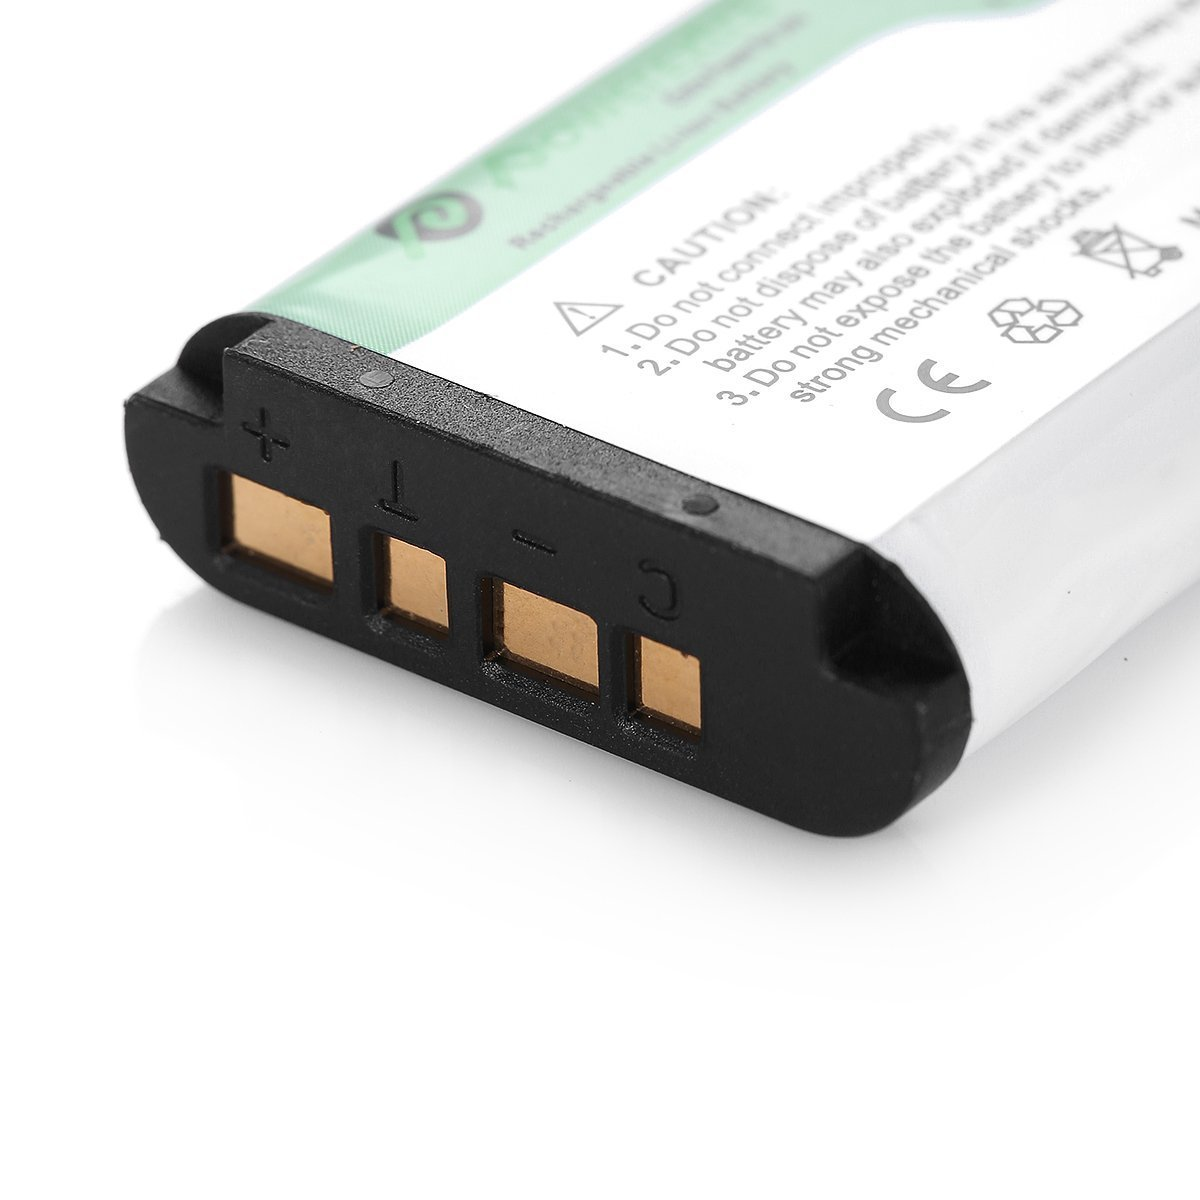 Powerextra 2 Pack Reemplazo Sony NP-BX1 Batería Li-ion con Cargador para Sony NP-BX1 / M8 y Sony Cyber-shot DSC-RX100, DSC-RX100 II, DSC-RX100 III, DSC-RX100 V, DSC-RX100 IV, HDR-CX405